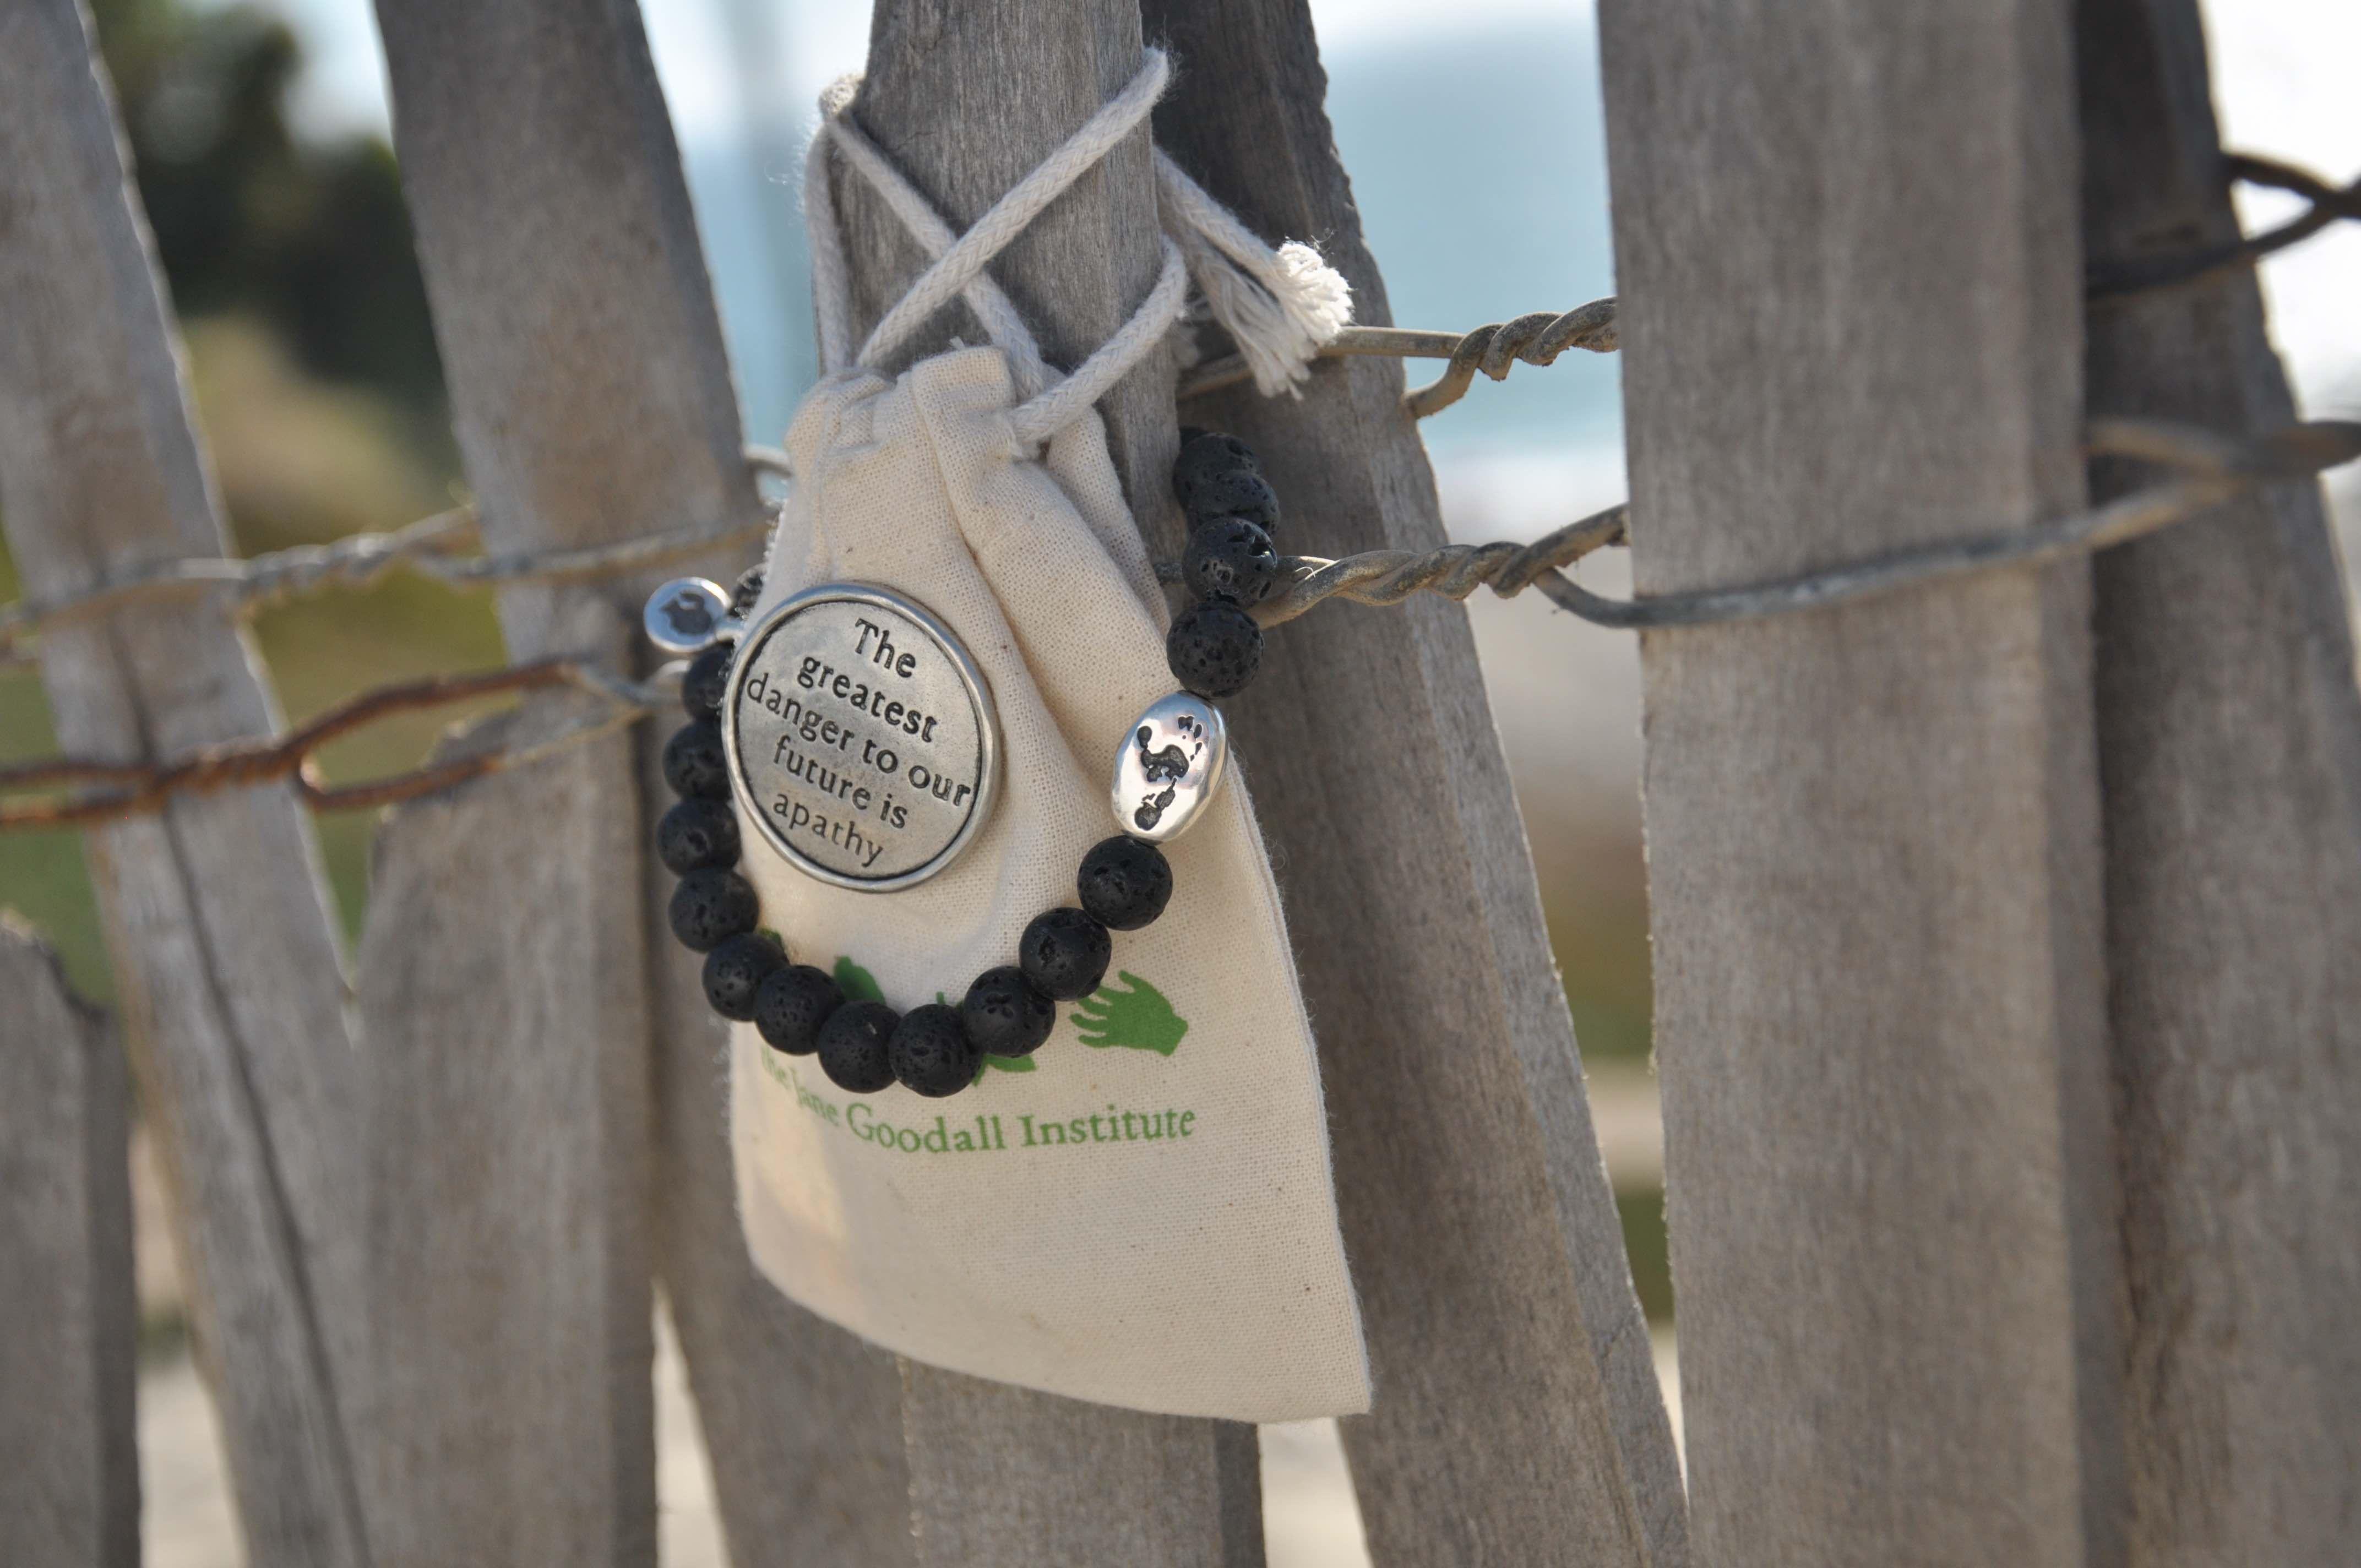 Jane Goodall Signature Wounda Footprint Bracelet & Apathy Quote Pin Set - JGI268